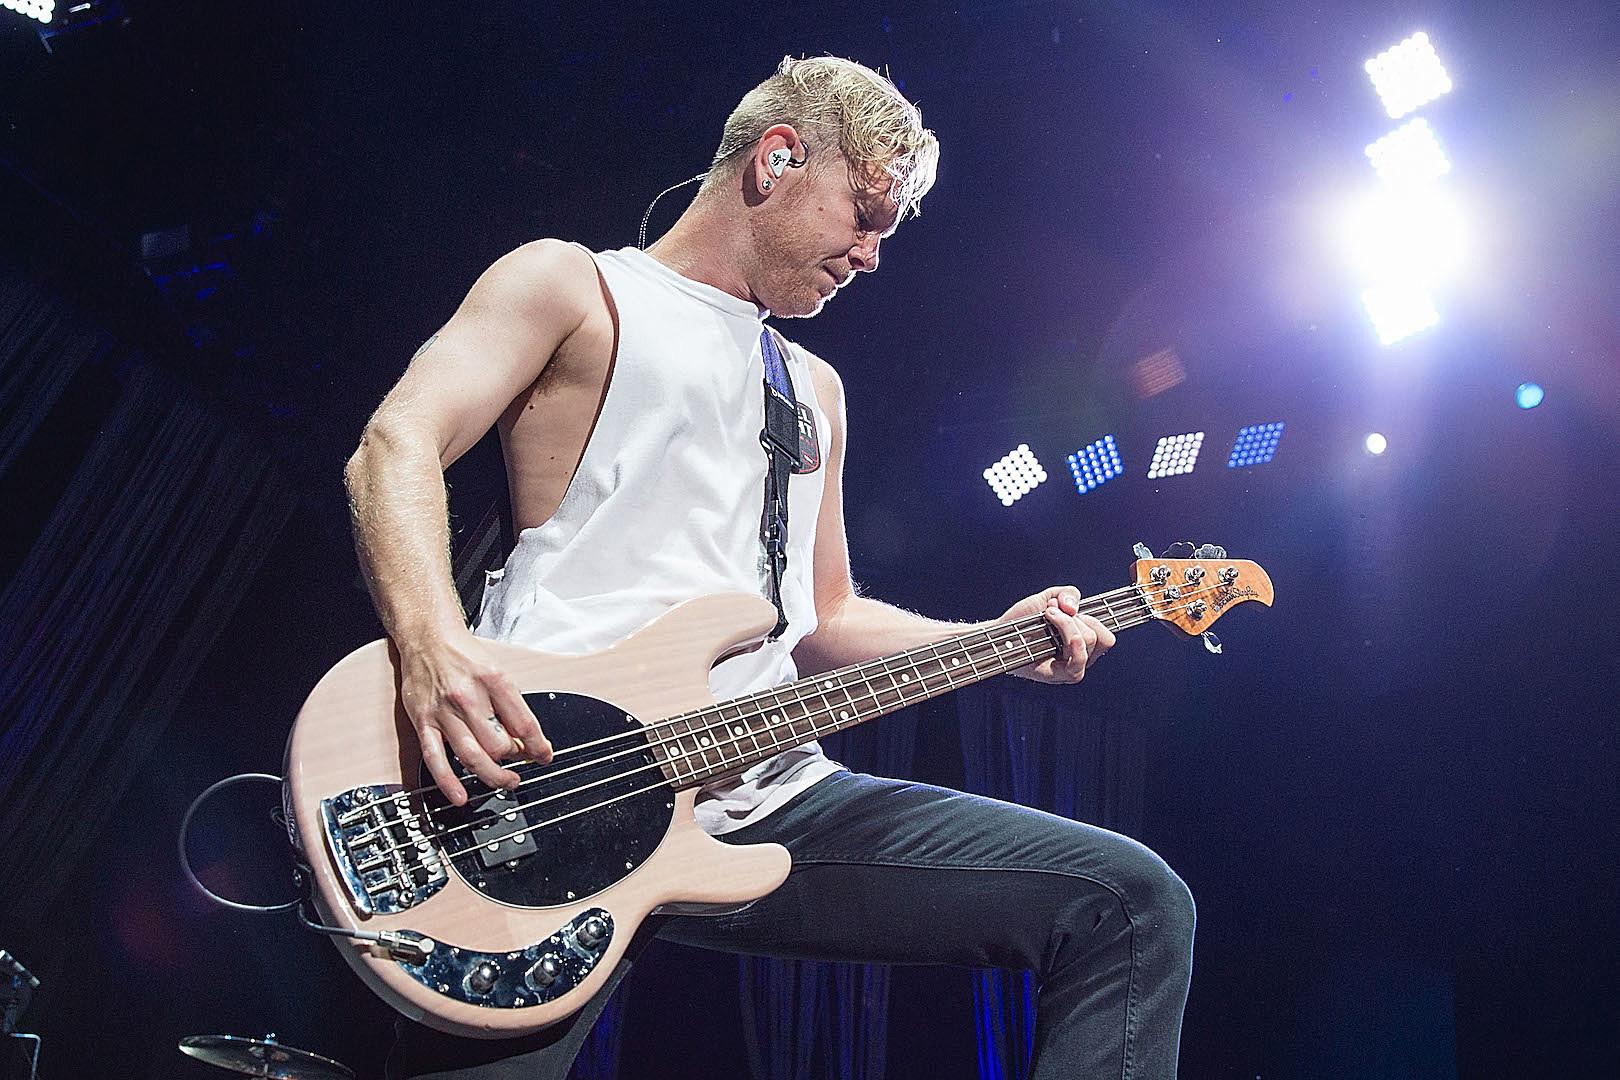 Deadly 2017 Crash Involving Former ADTR Bassist Comes to Light